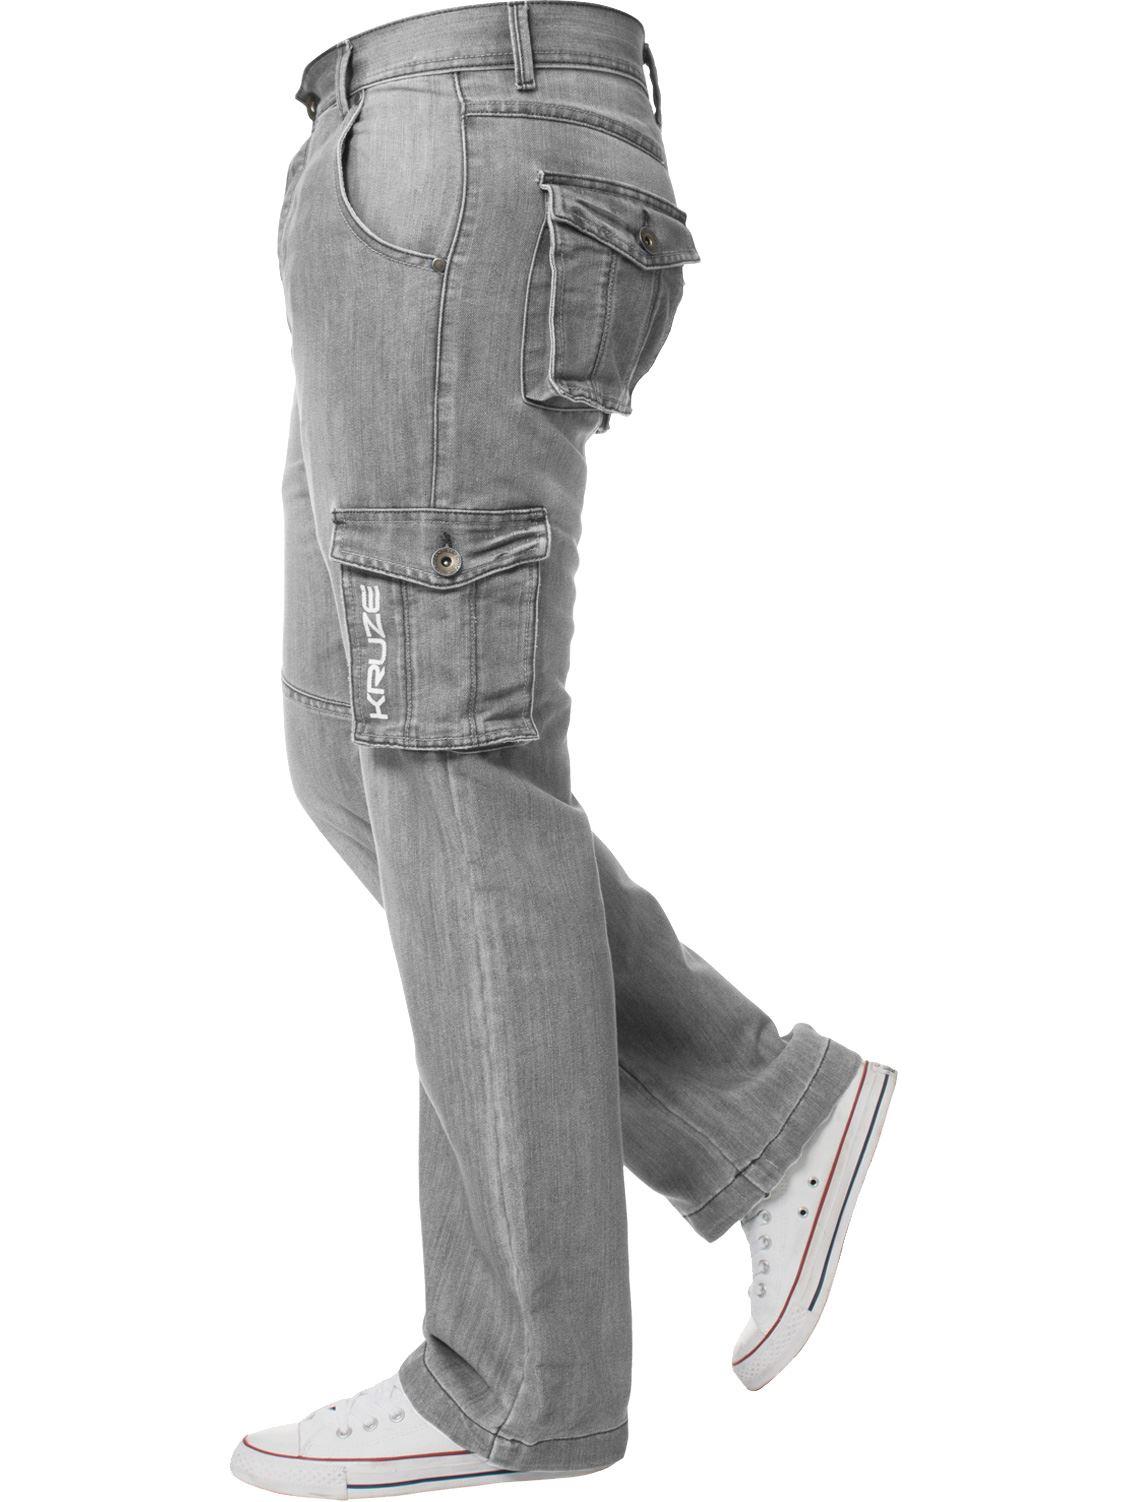 Grandes-jeans-para-hombre-de-combate-de-Kruze-Rey-Alto-Pierna-Cargo-Pantalones-Jeans-Pantalones miniatura 21